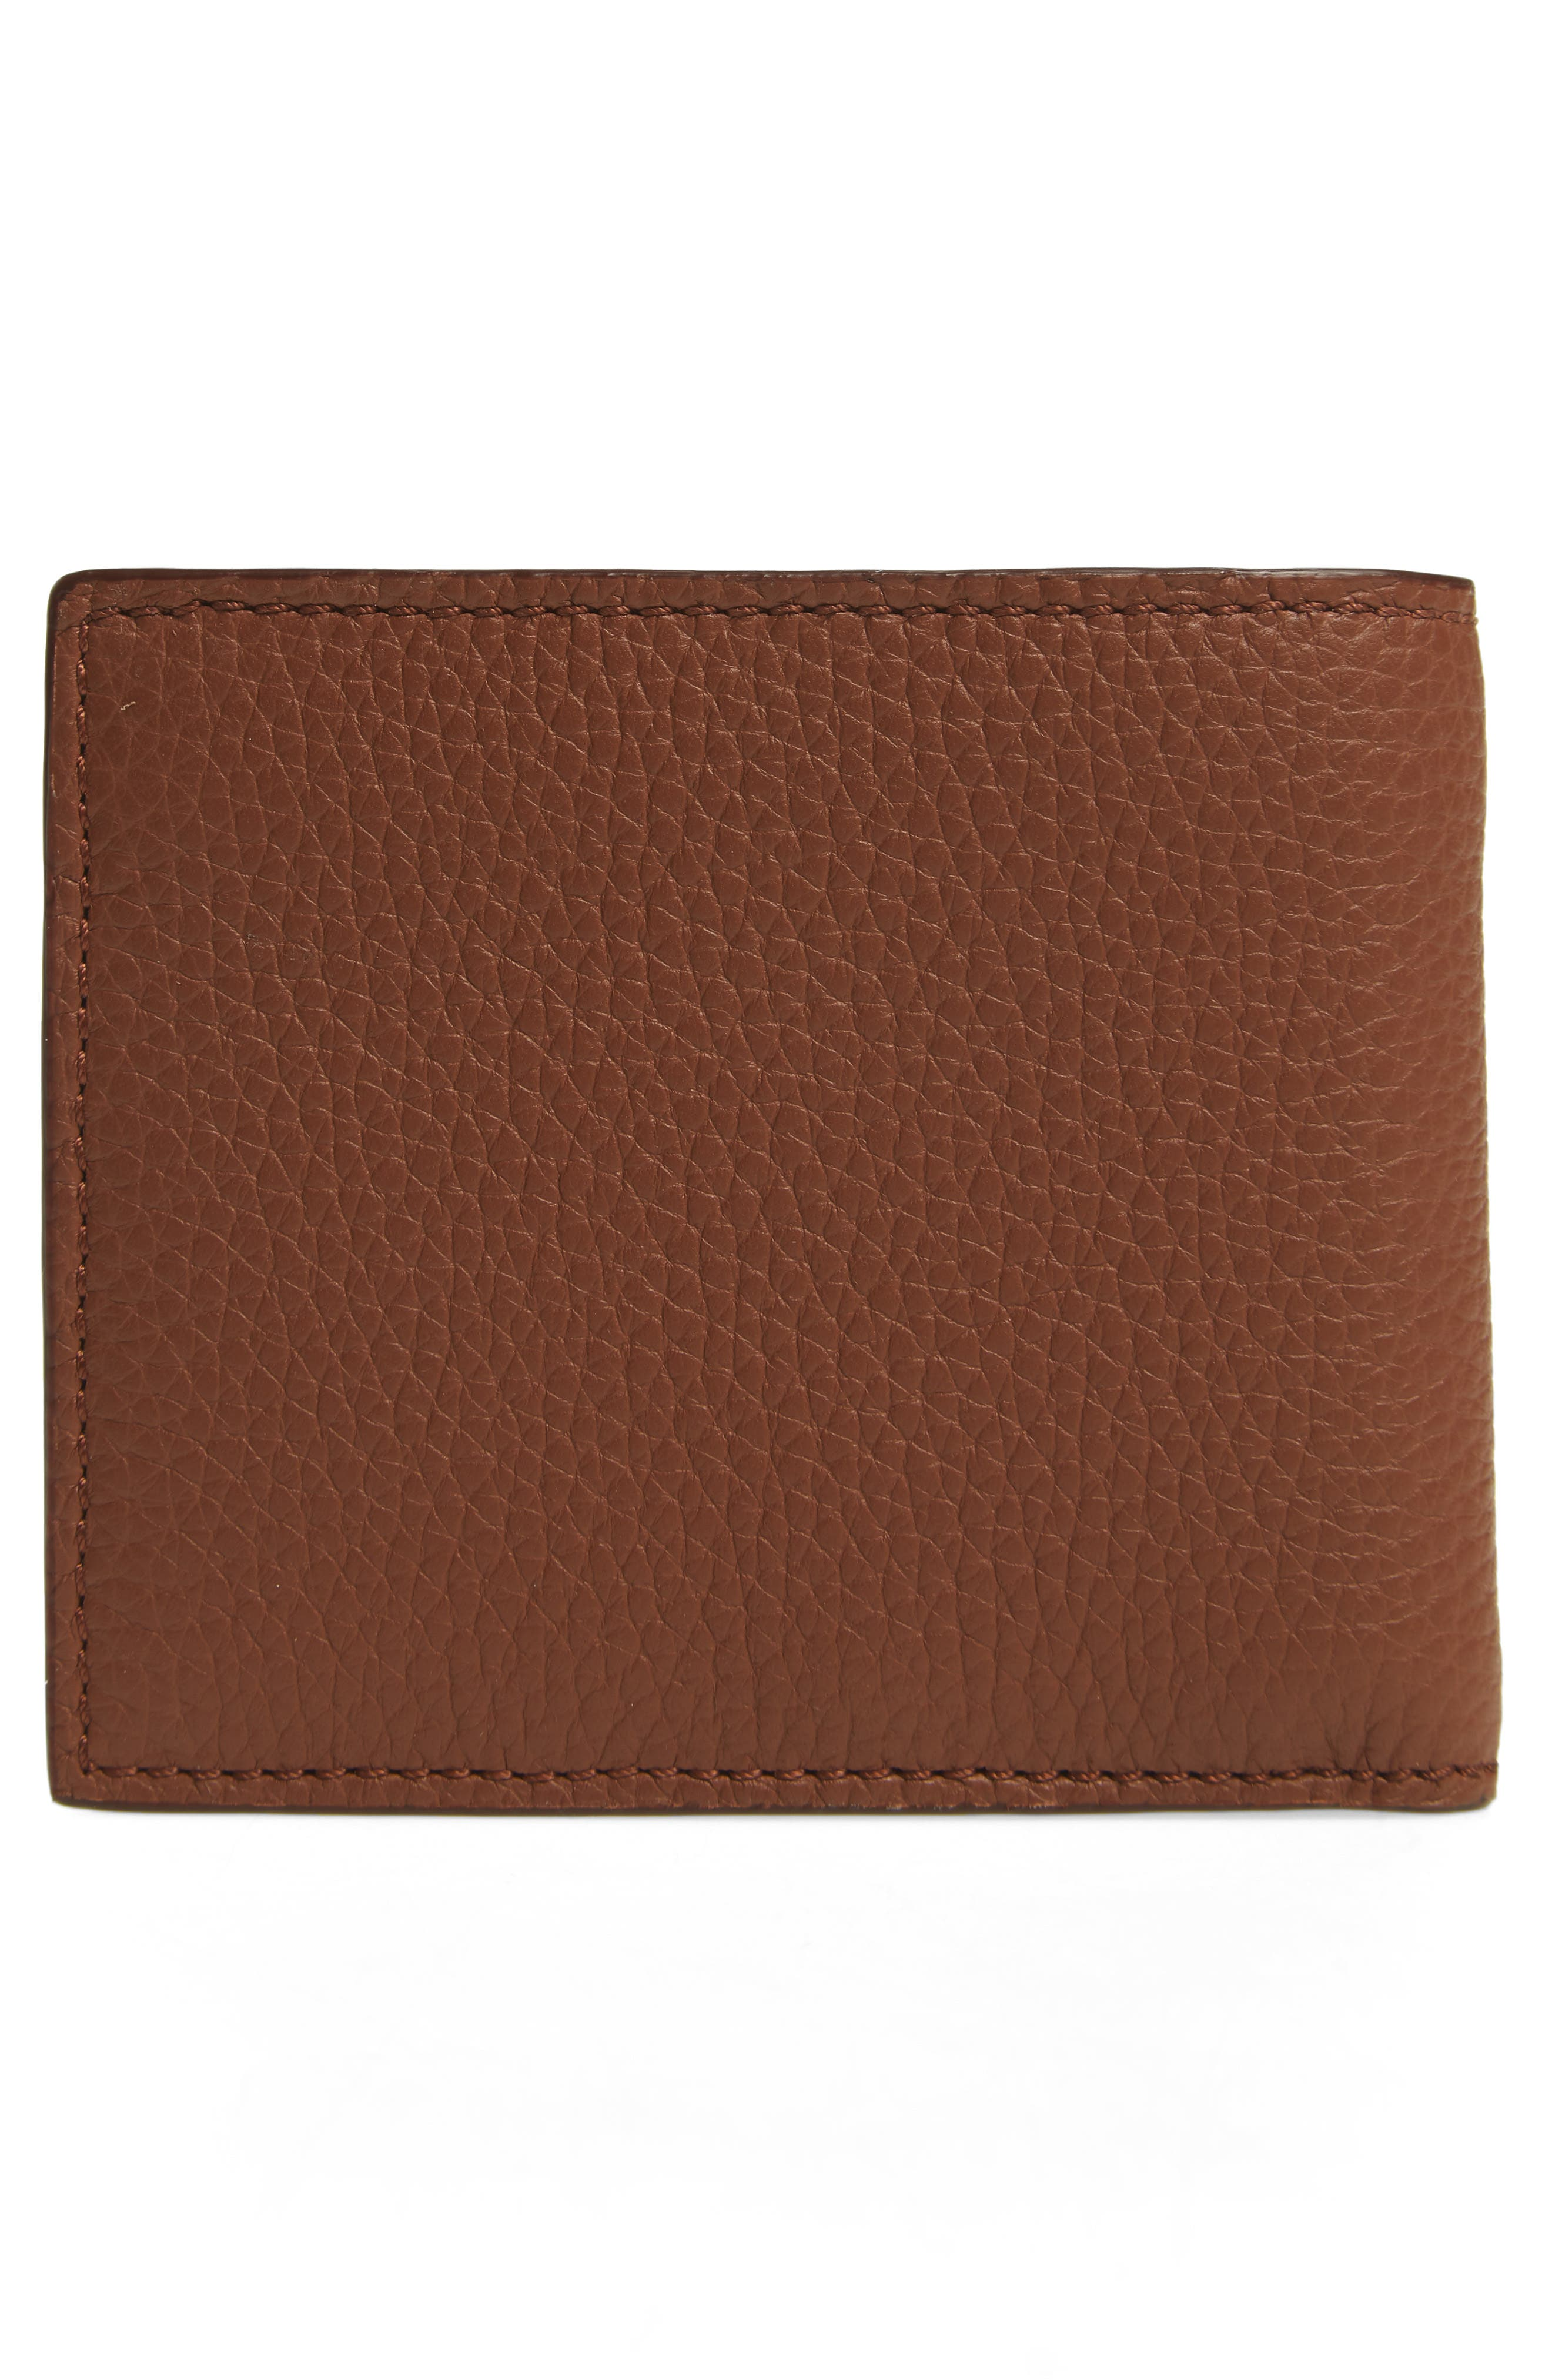 Billfold Wallet,                             Alternate thumbnail 3, color,                             Chestnut Brown